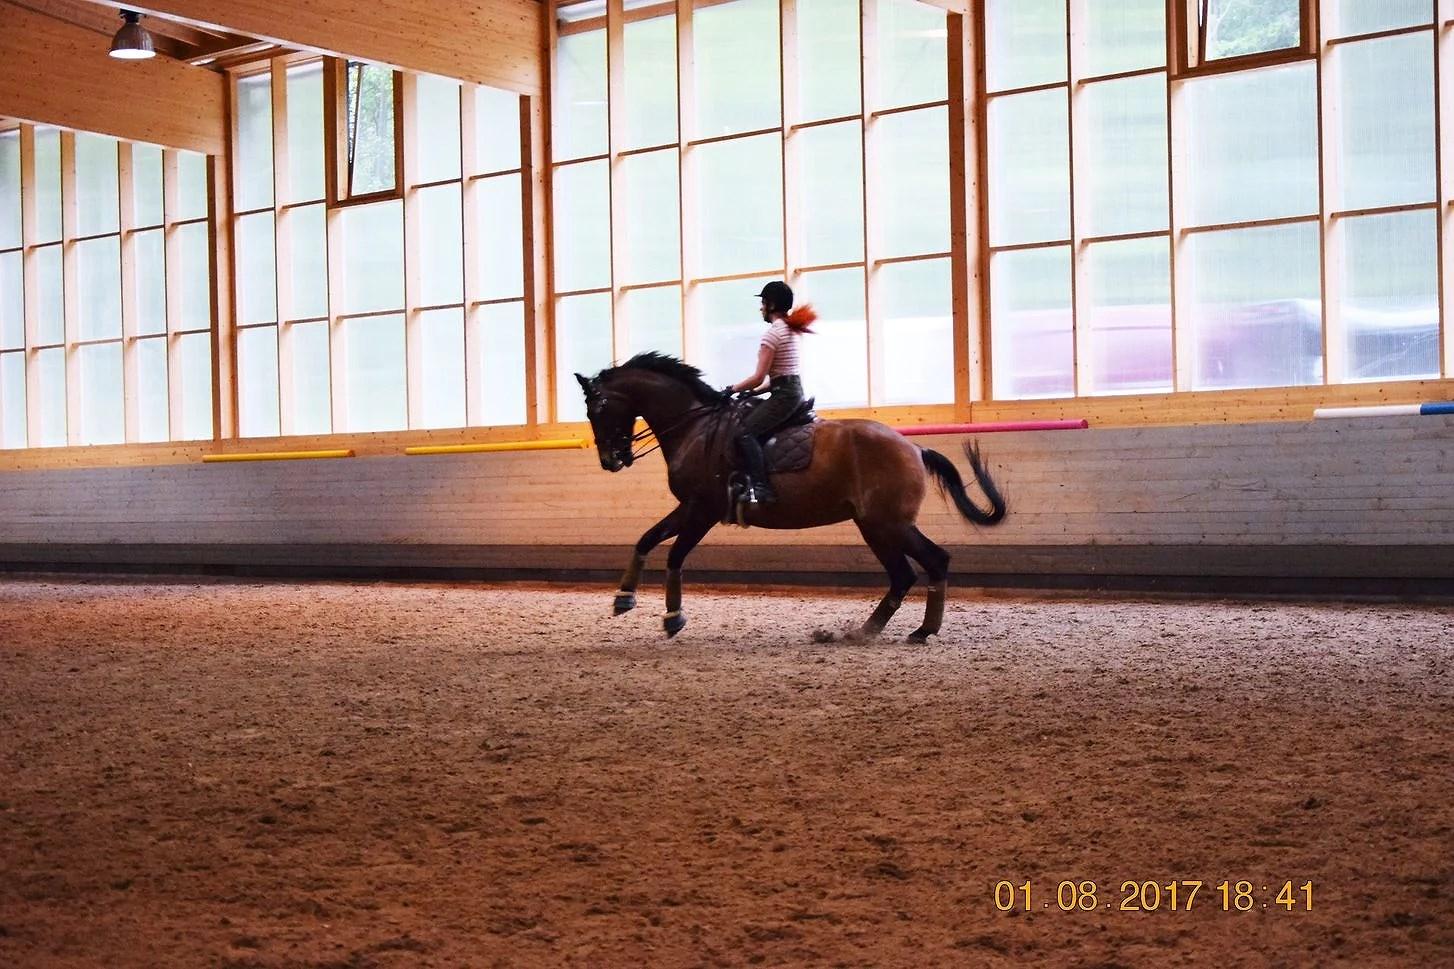 Kehityskohteeni ratsastajana